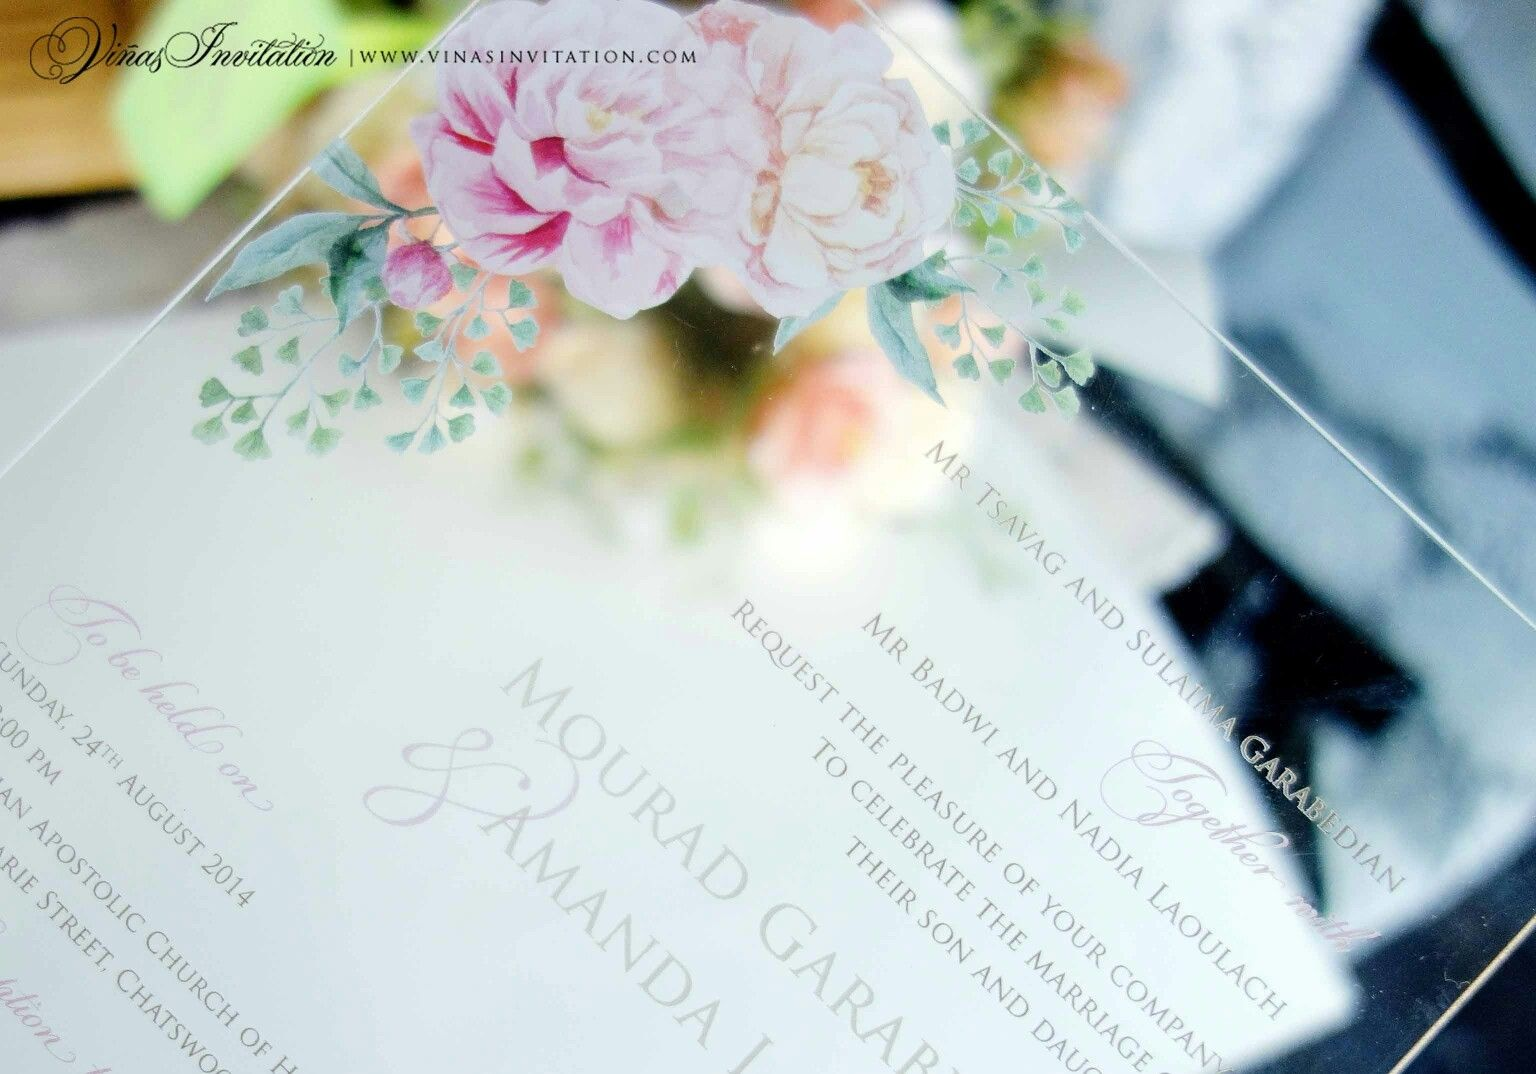 Wedding Invitations Sydney: Vinas Invitation. Acrylic Invitation. Sydney Wedding